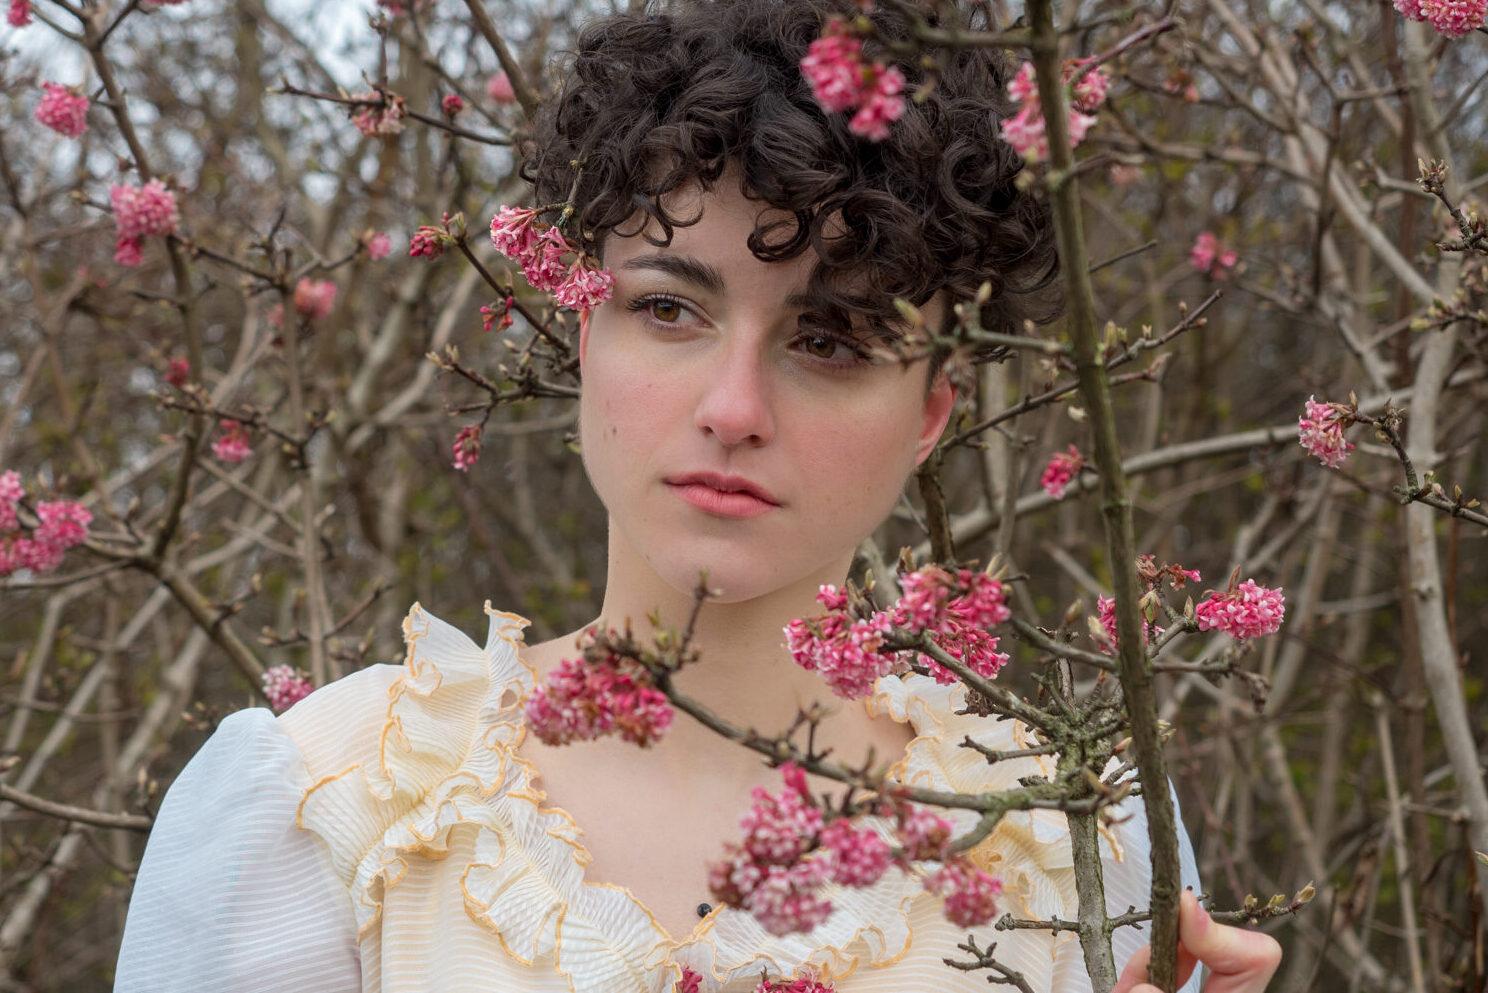 Model Clare met bloesem